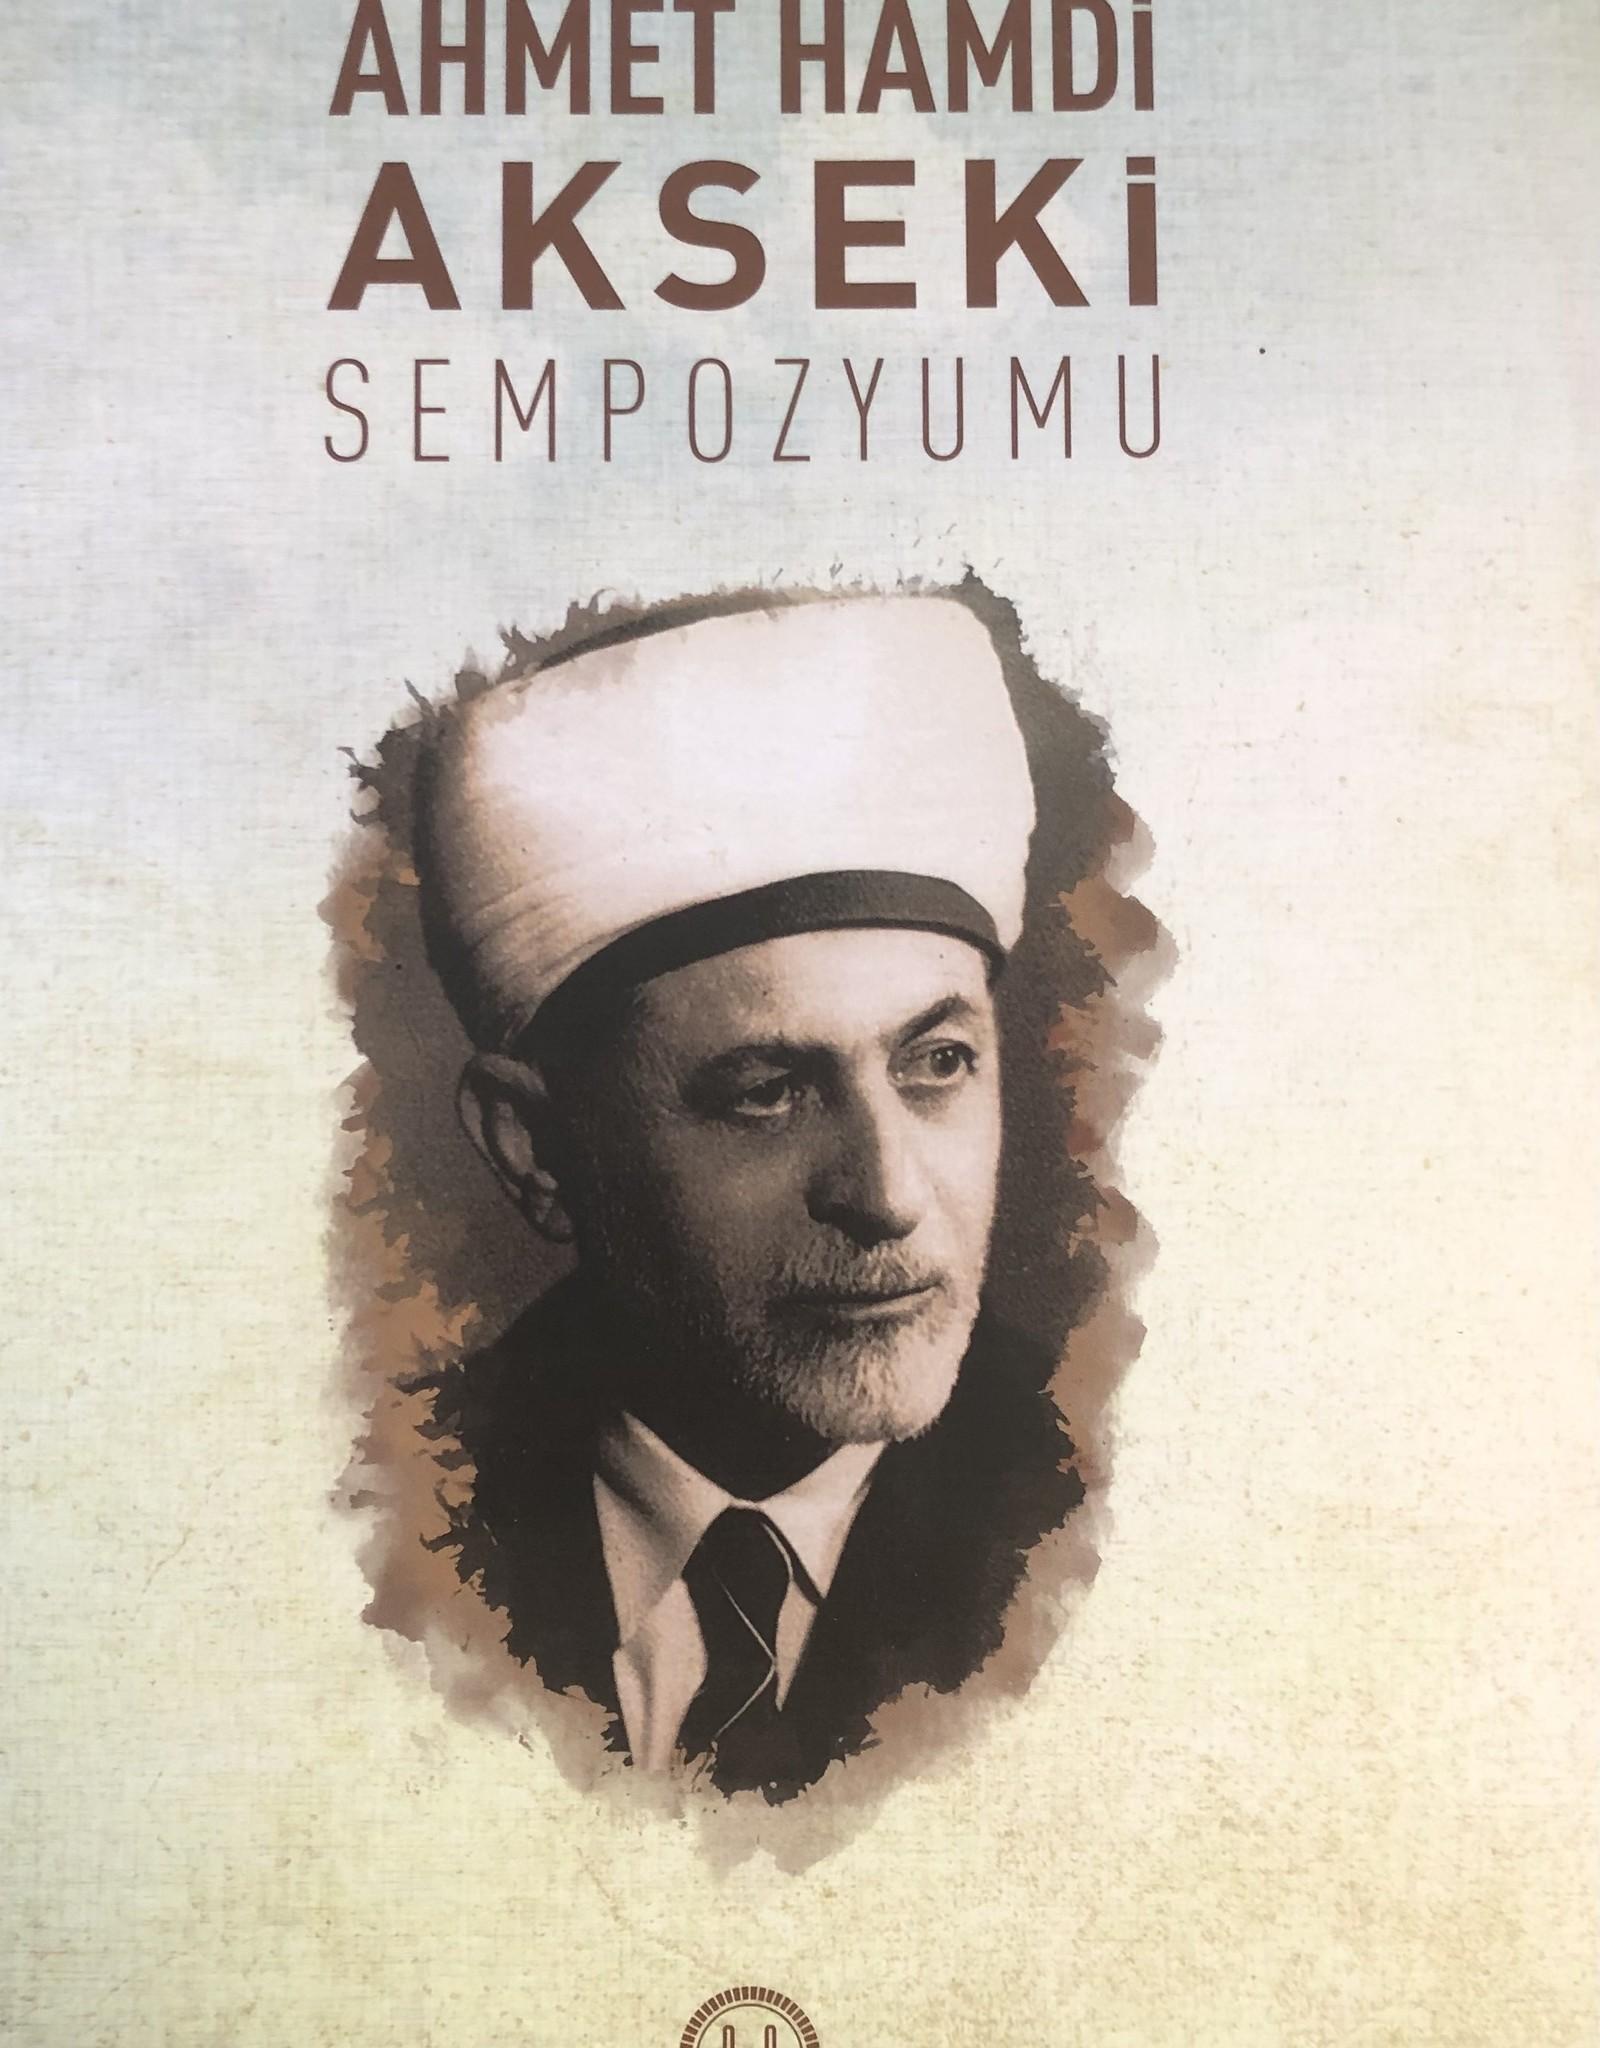 Ahmet Hamdi Akseki Sempozyumu